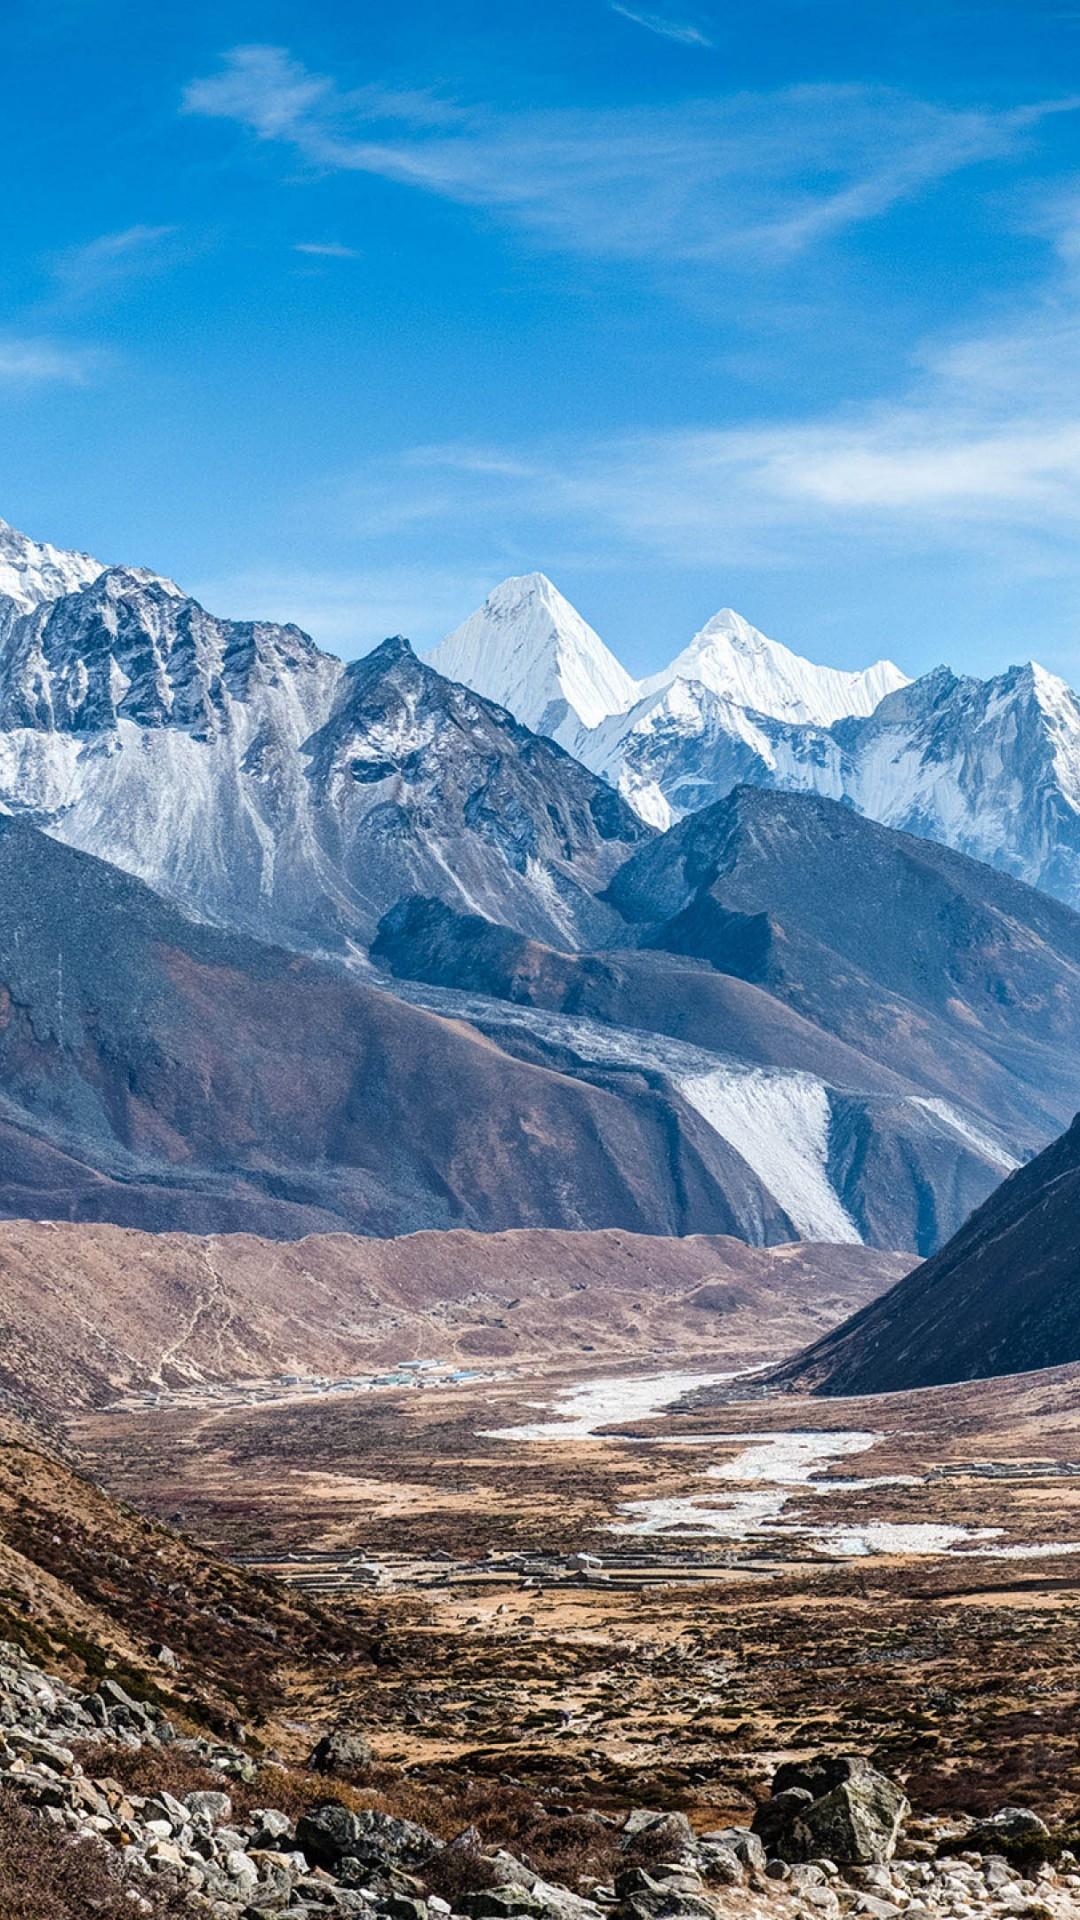 Wallpaper Ama Dablam Nepal Mountains 4k Nature 16555